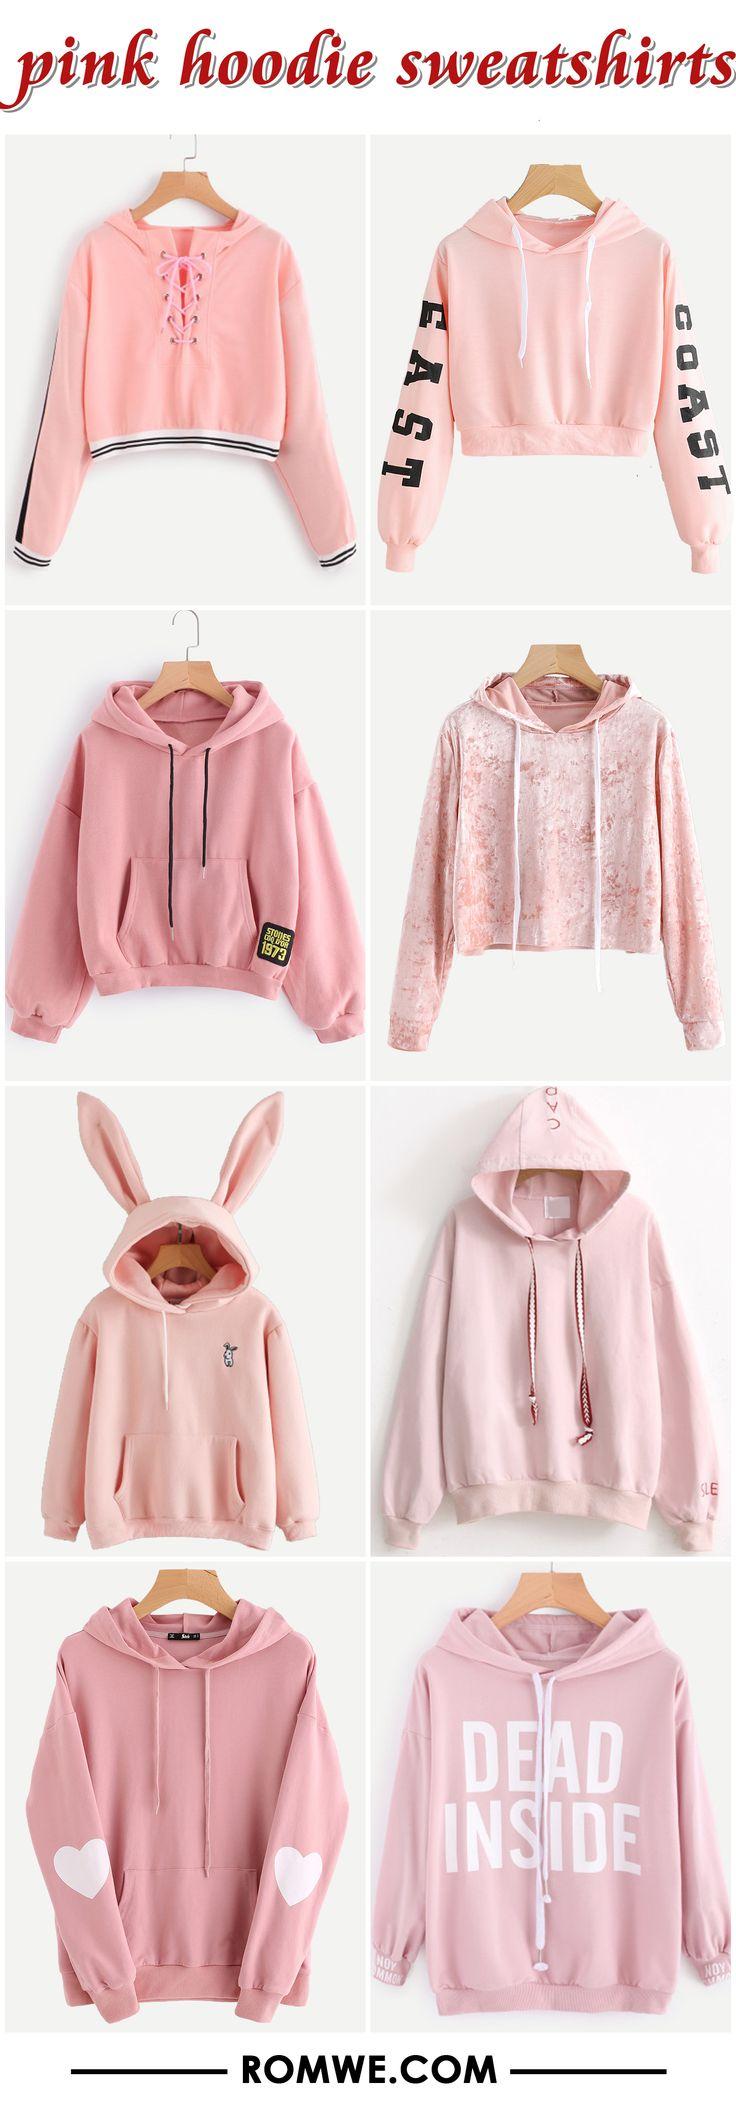 black friday sale - pink hoodie sweatshirts from rowme.com